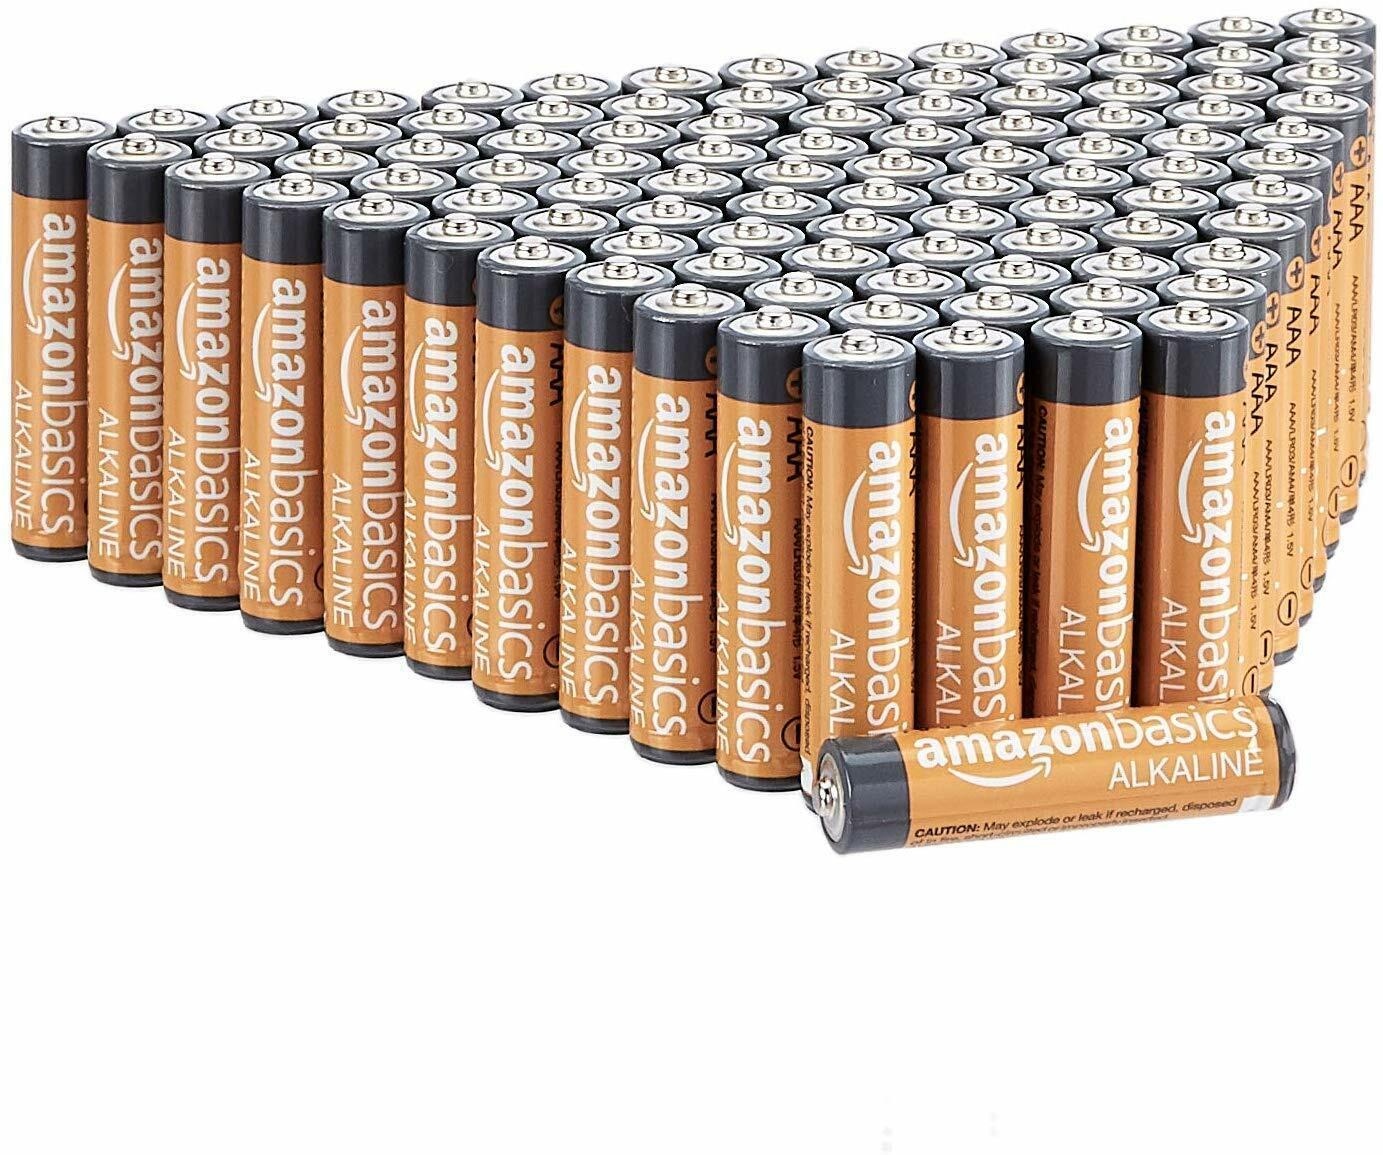 AmazonBasics AAA Performance Alkaline Batteries 100-Pack